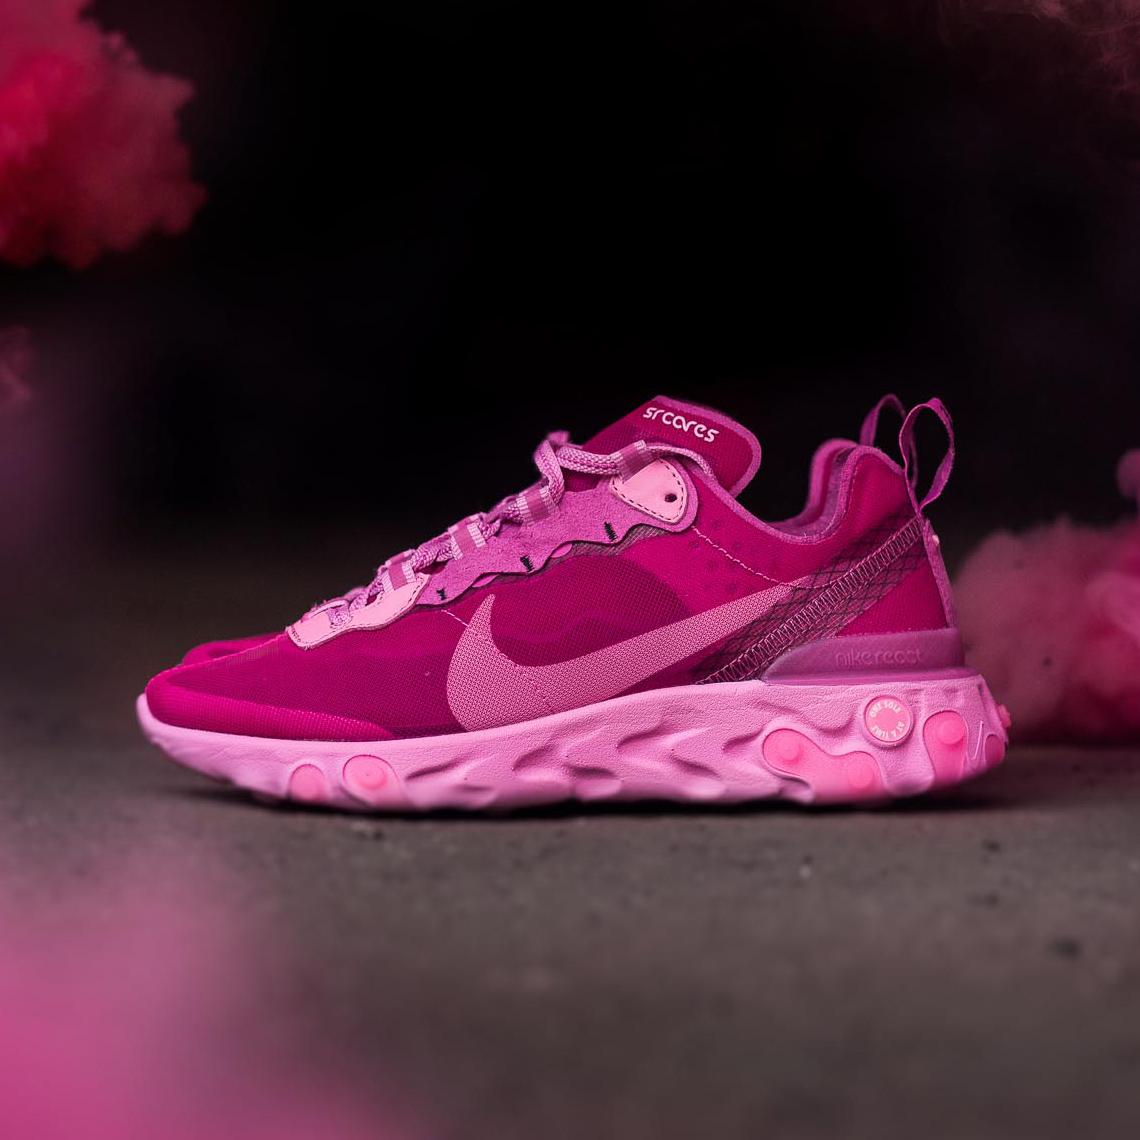 Sneaker Room Nike React Element 87 Pink